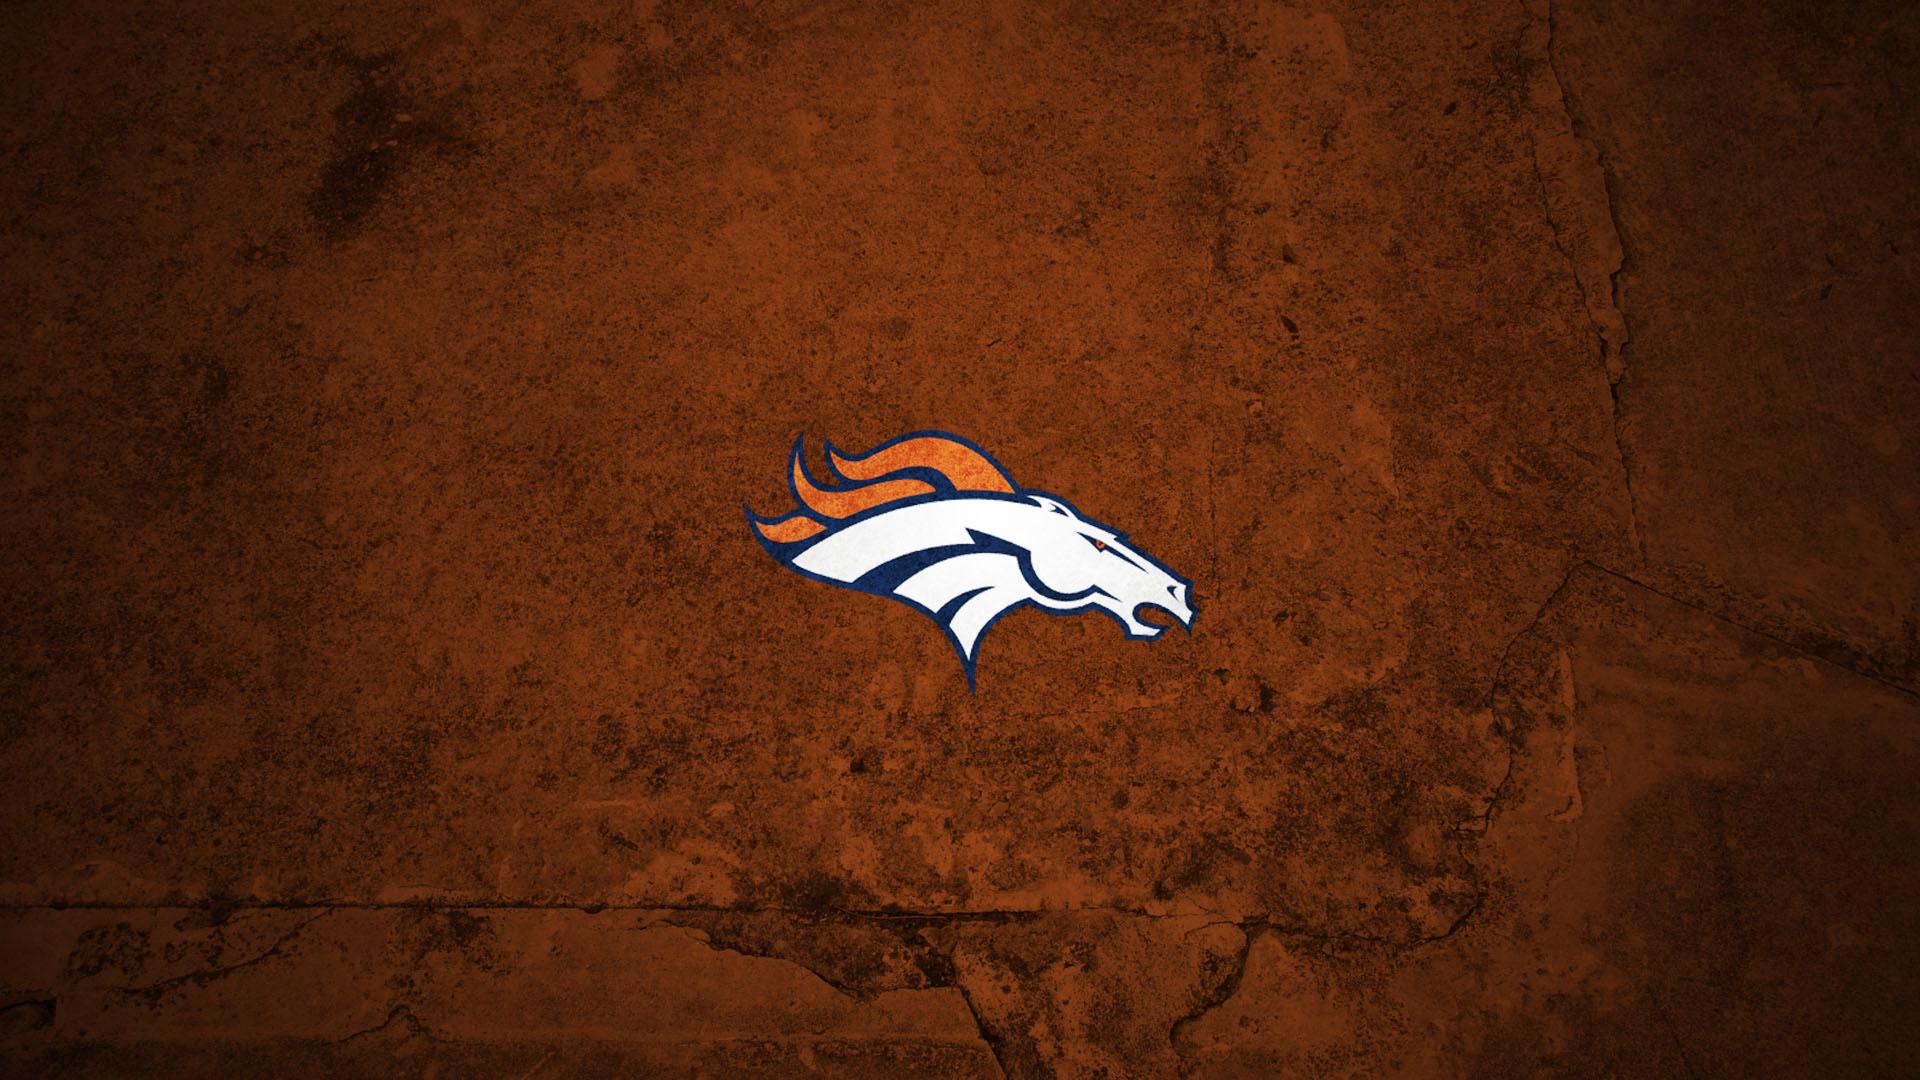 Denvor Broncos Logo Wallpaper   Nexus Wallpaper 1920x1080